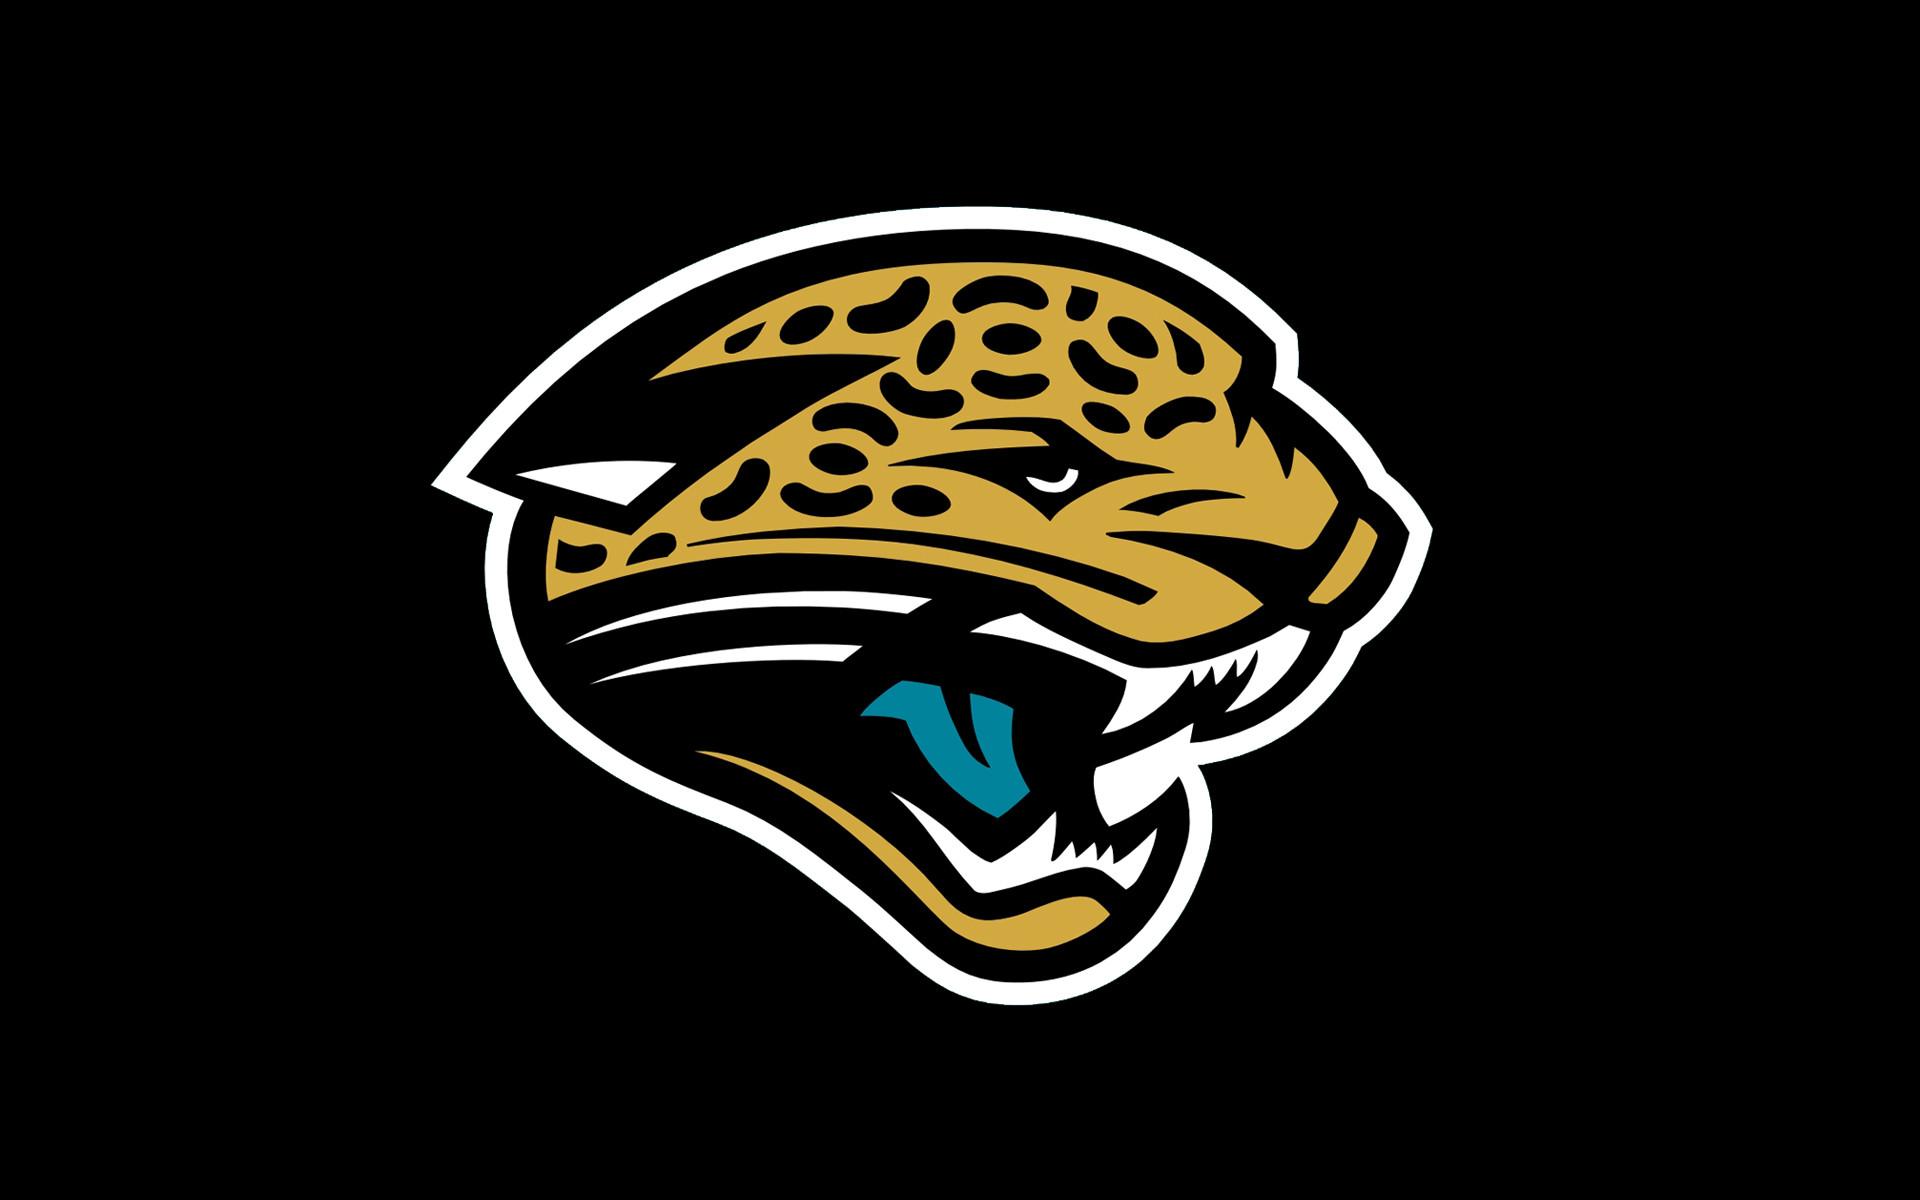 Jacksonville Jaguars Wallpaper 2